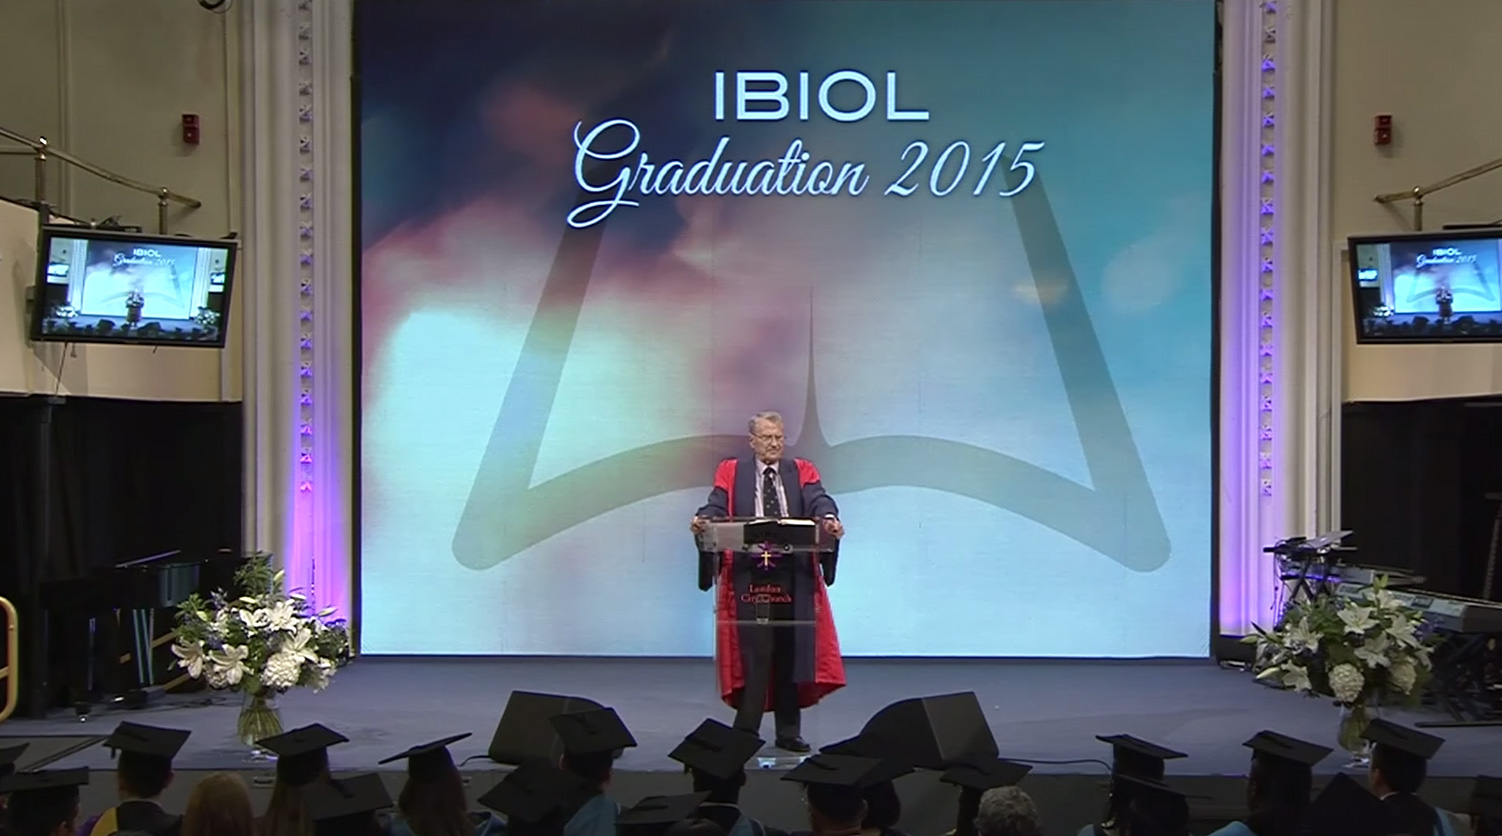 IBIOL Graduation